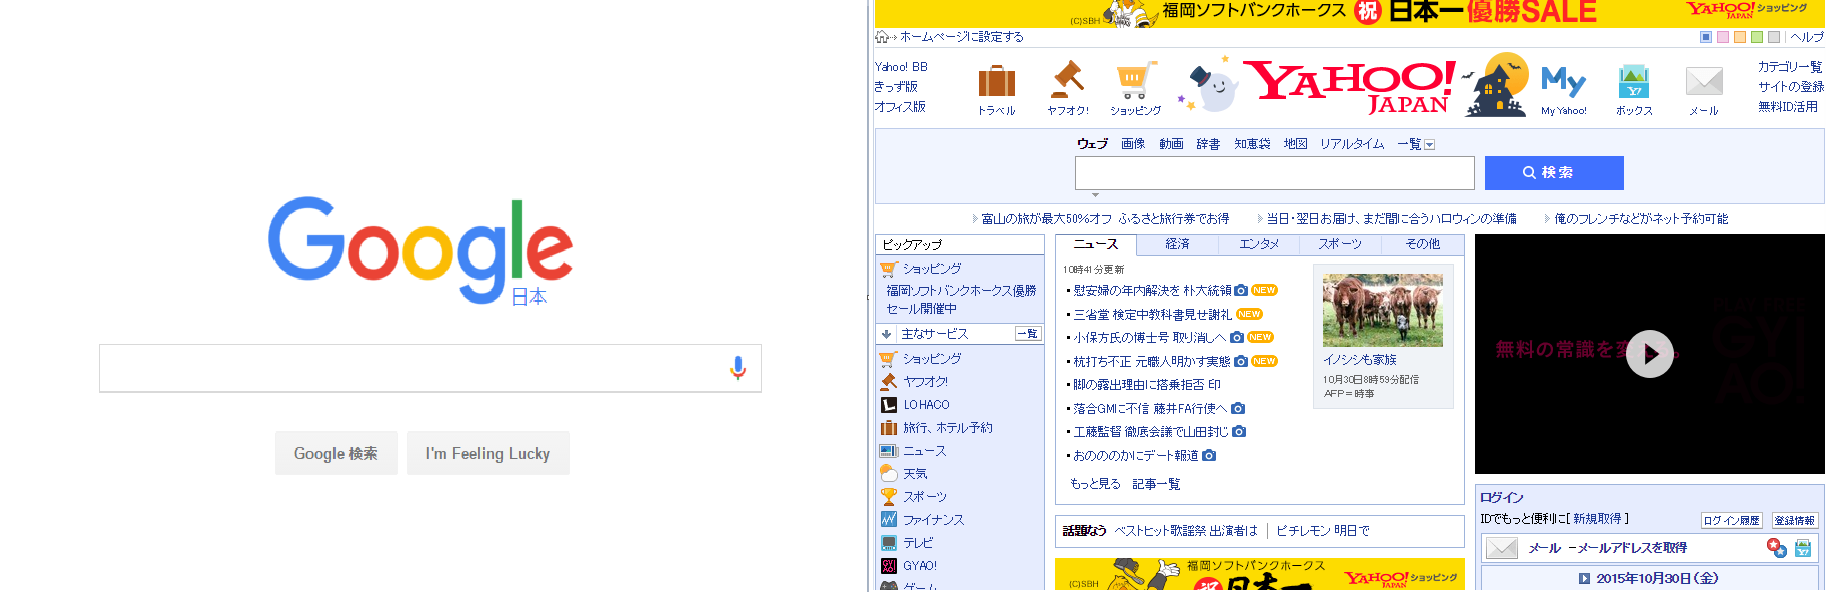 toppage google yahoo